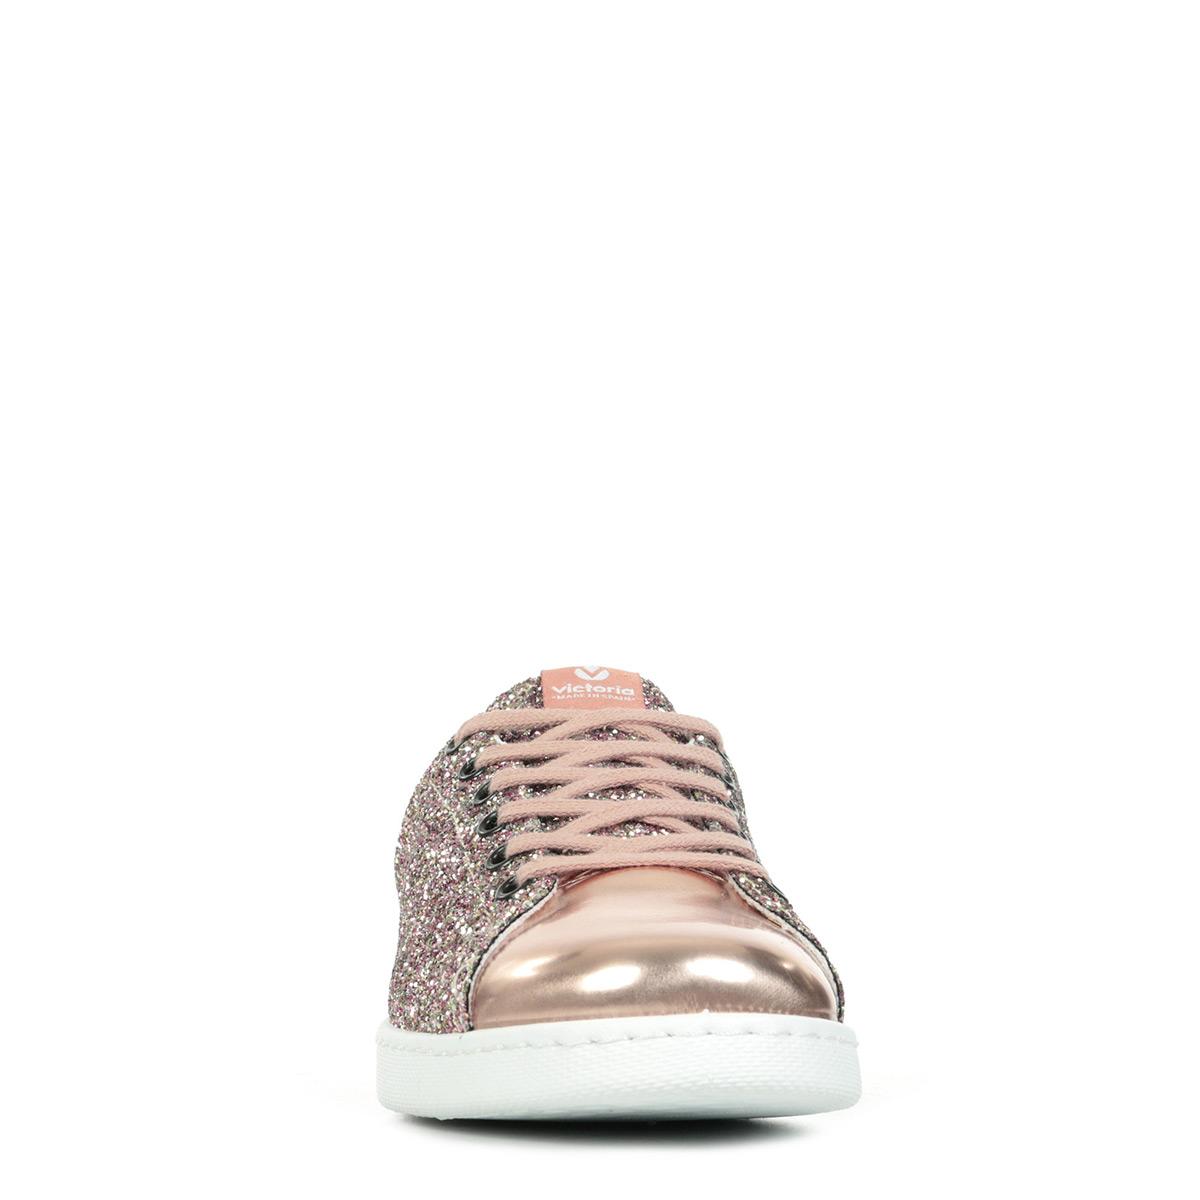 victoria deportivo basket glitter 12558rosa chaussures homme homme. Black Bedroom Furniture Sets. Home Design Ideas